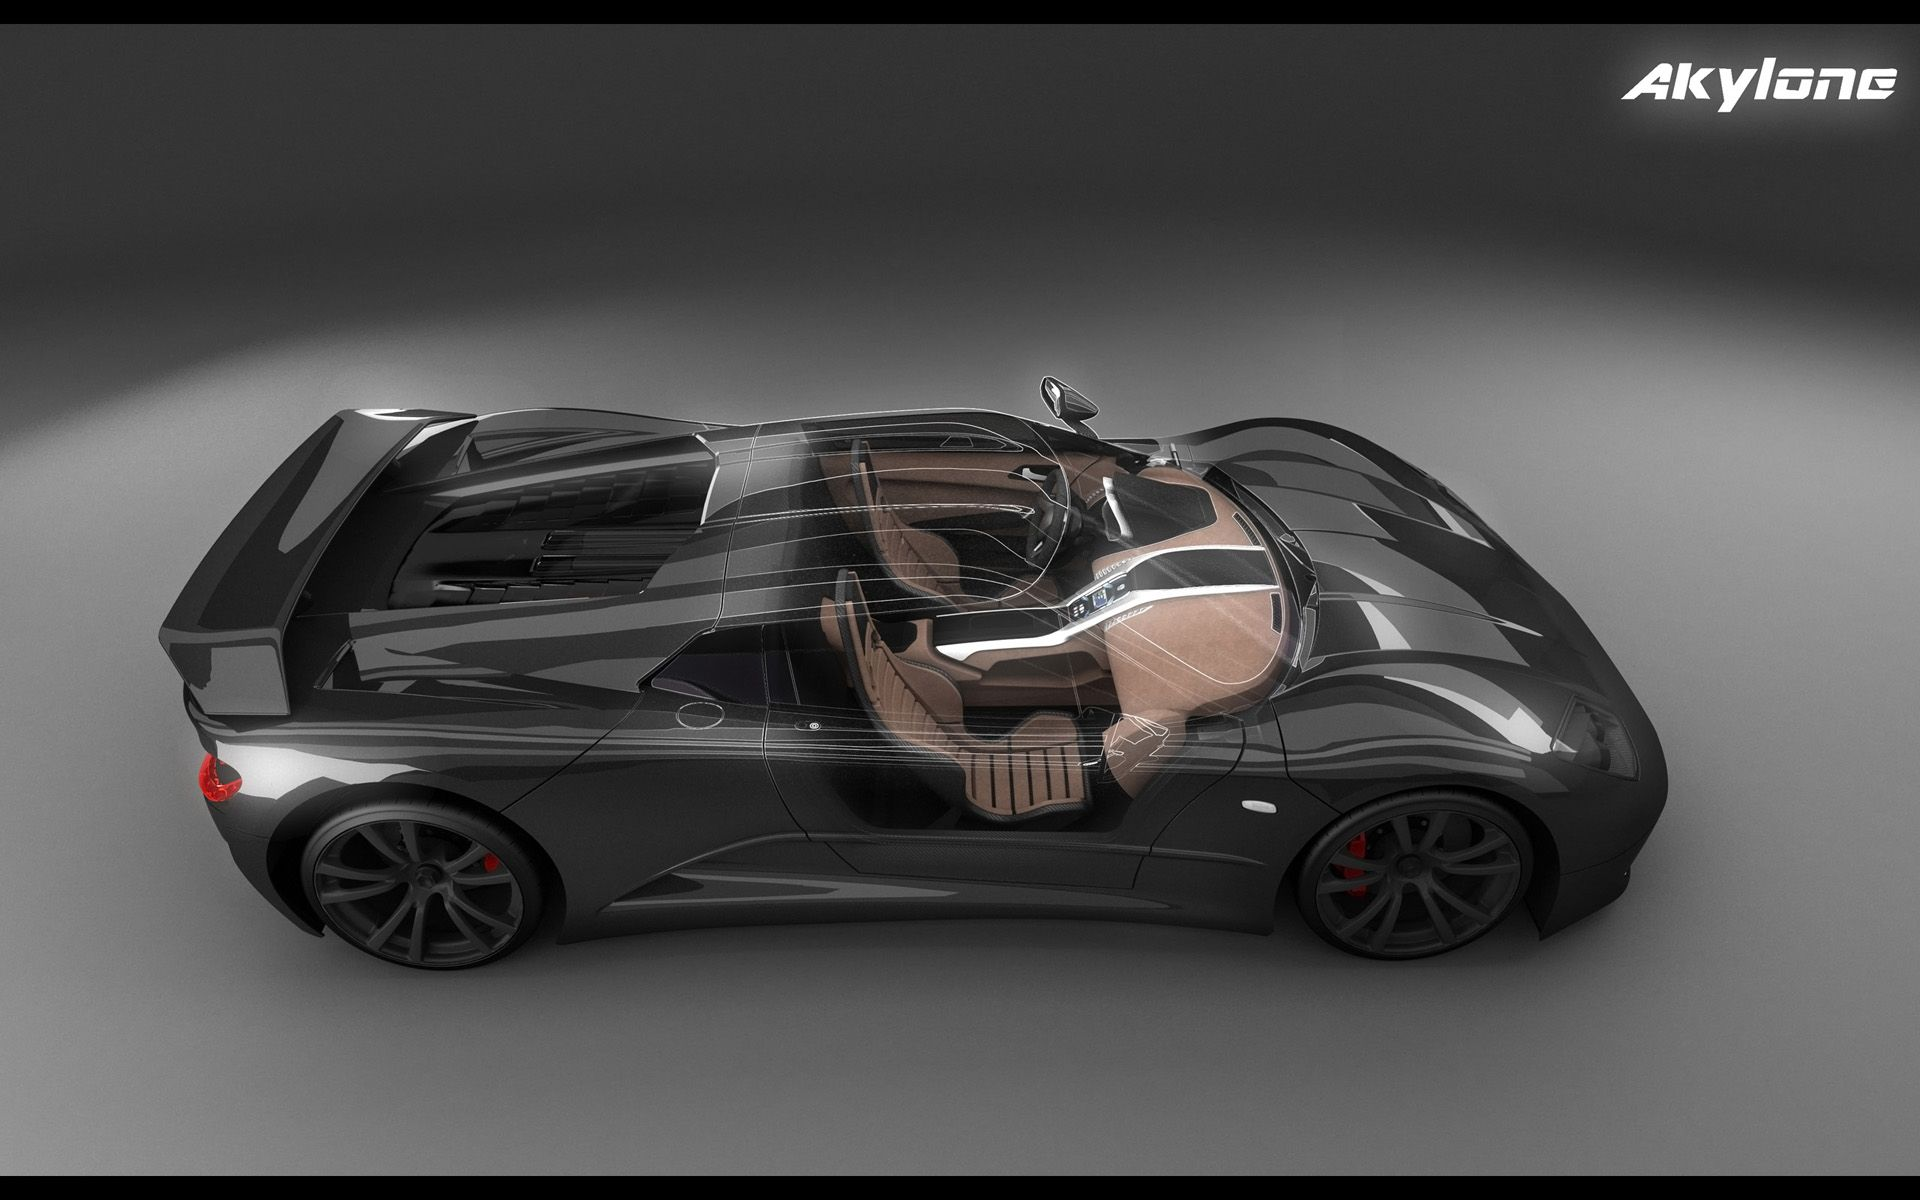 New Cars: Genty Alkylone Concept Car 2014